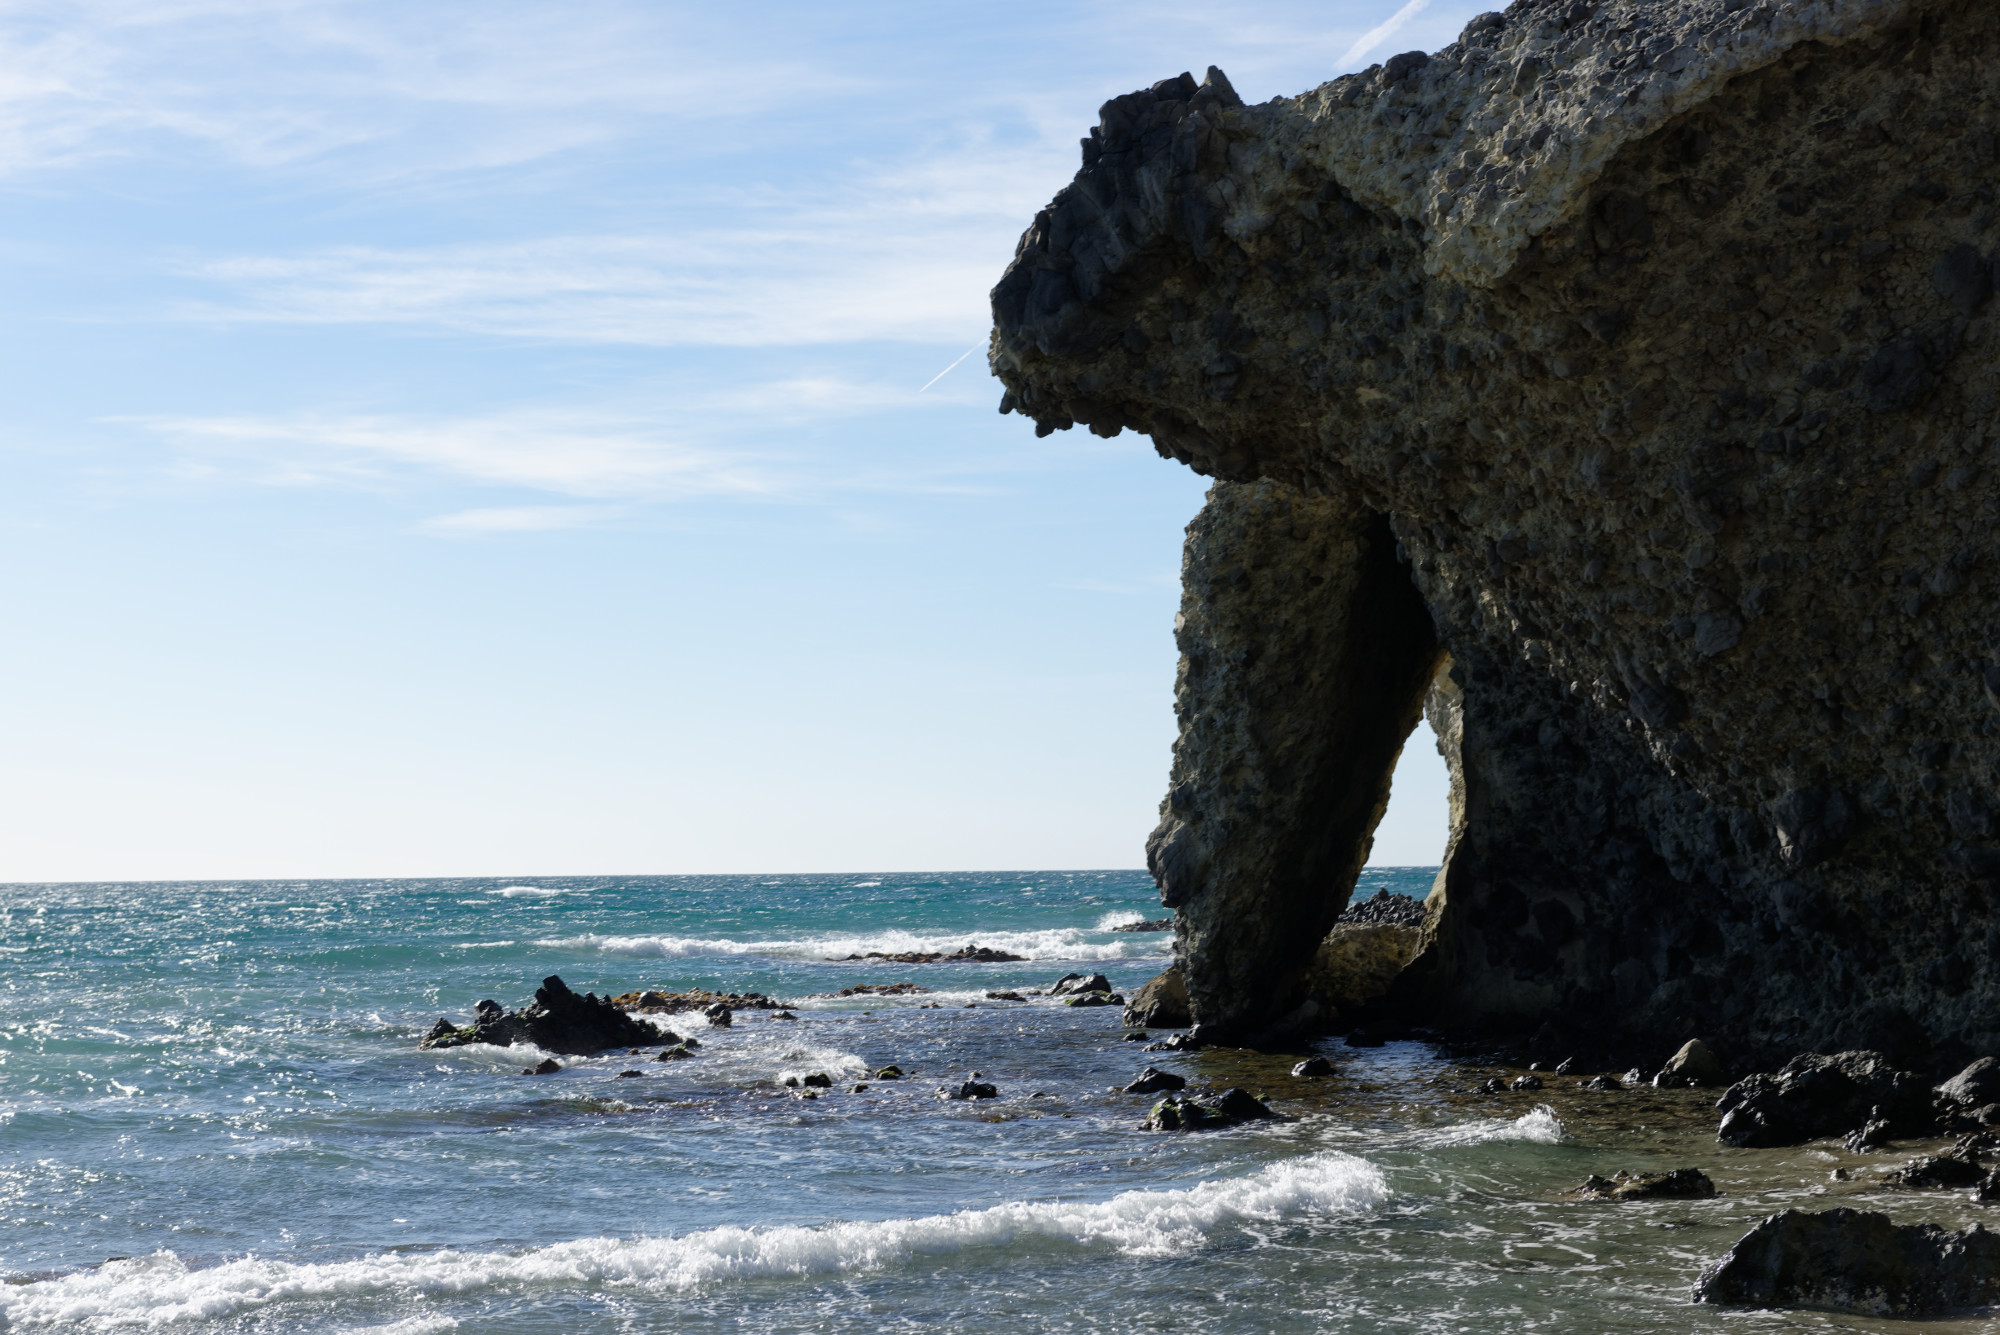 171214-San Jose-Playa del Monsul (Cabo de Gata-Andalousie) (199)